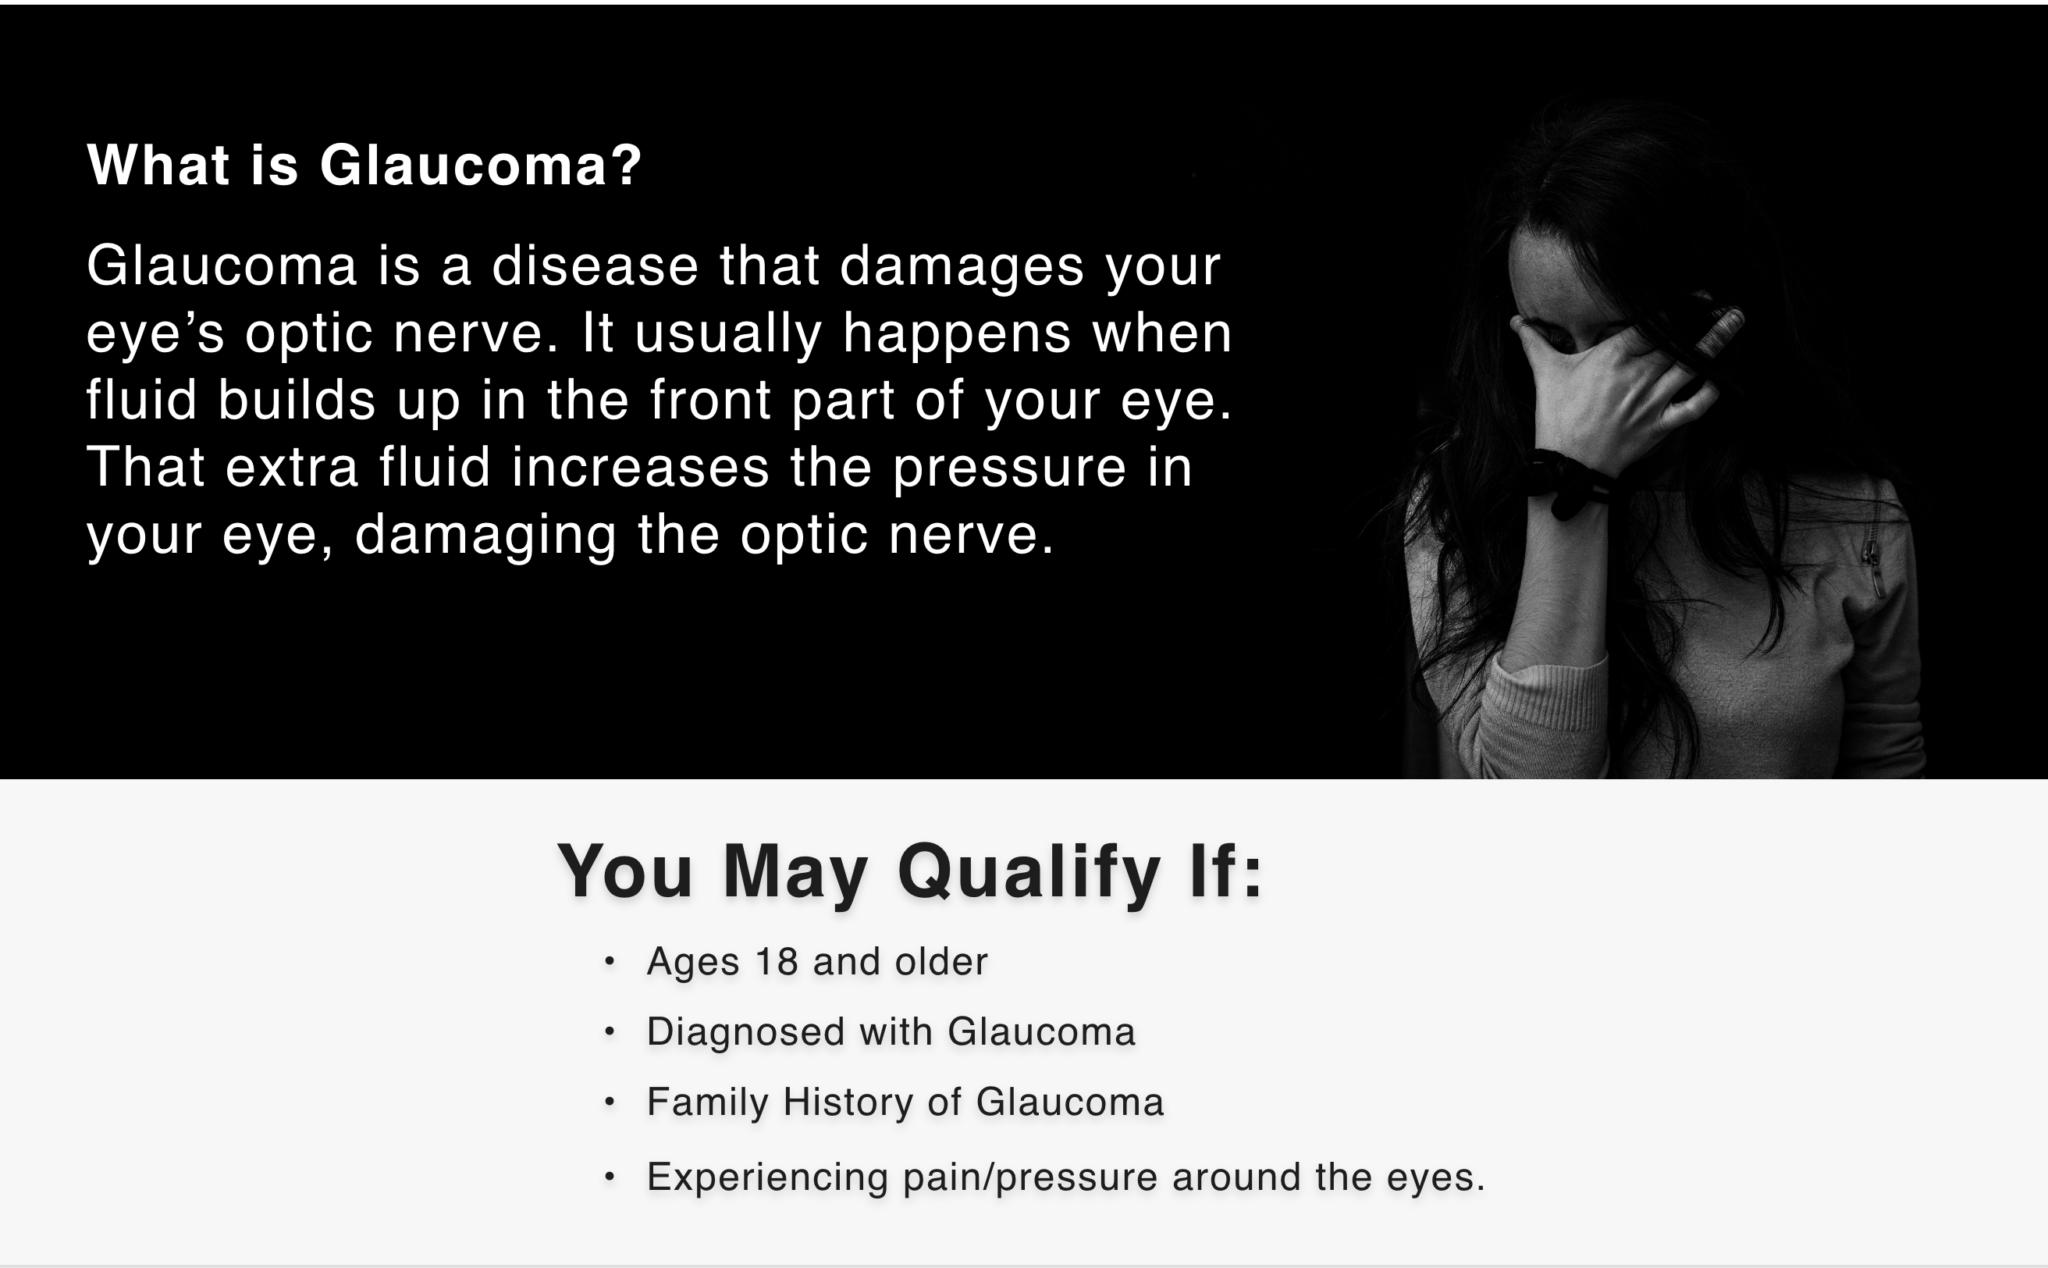 glaucoma-ocular-hypertension-landing-page-info